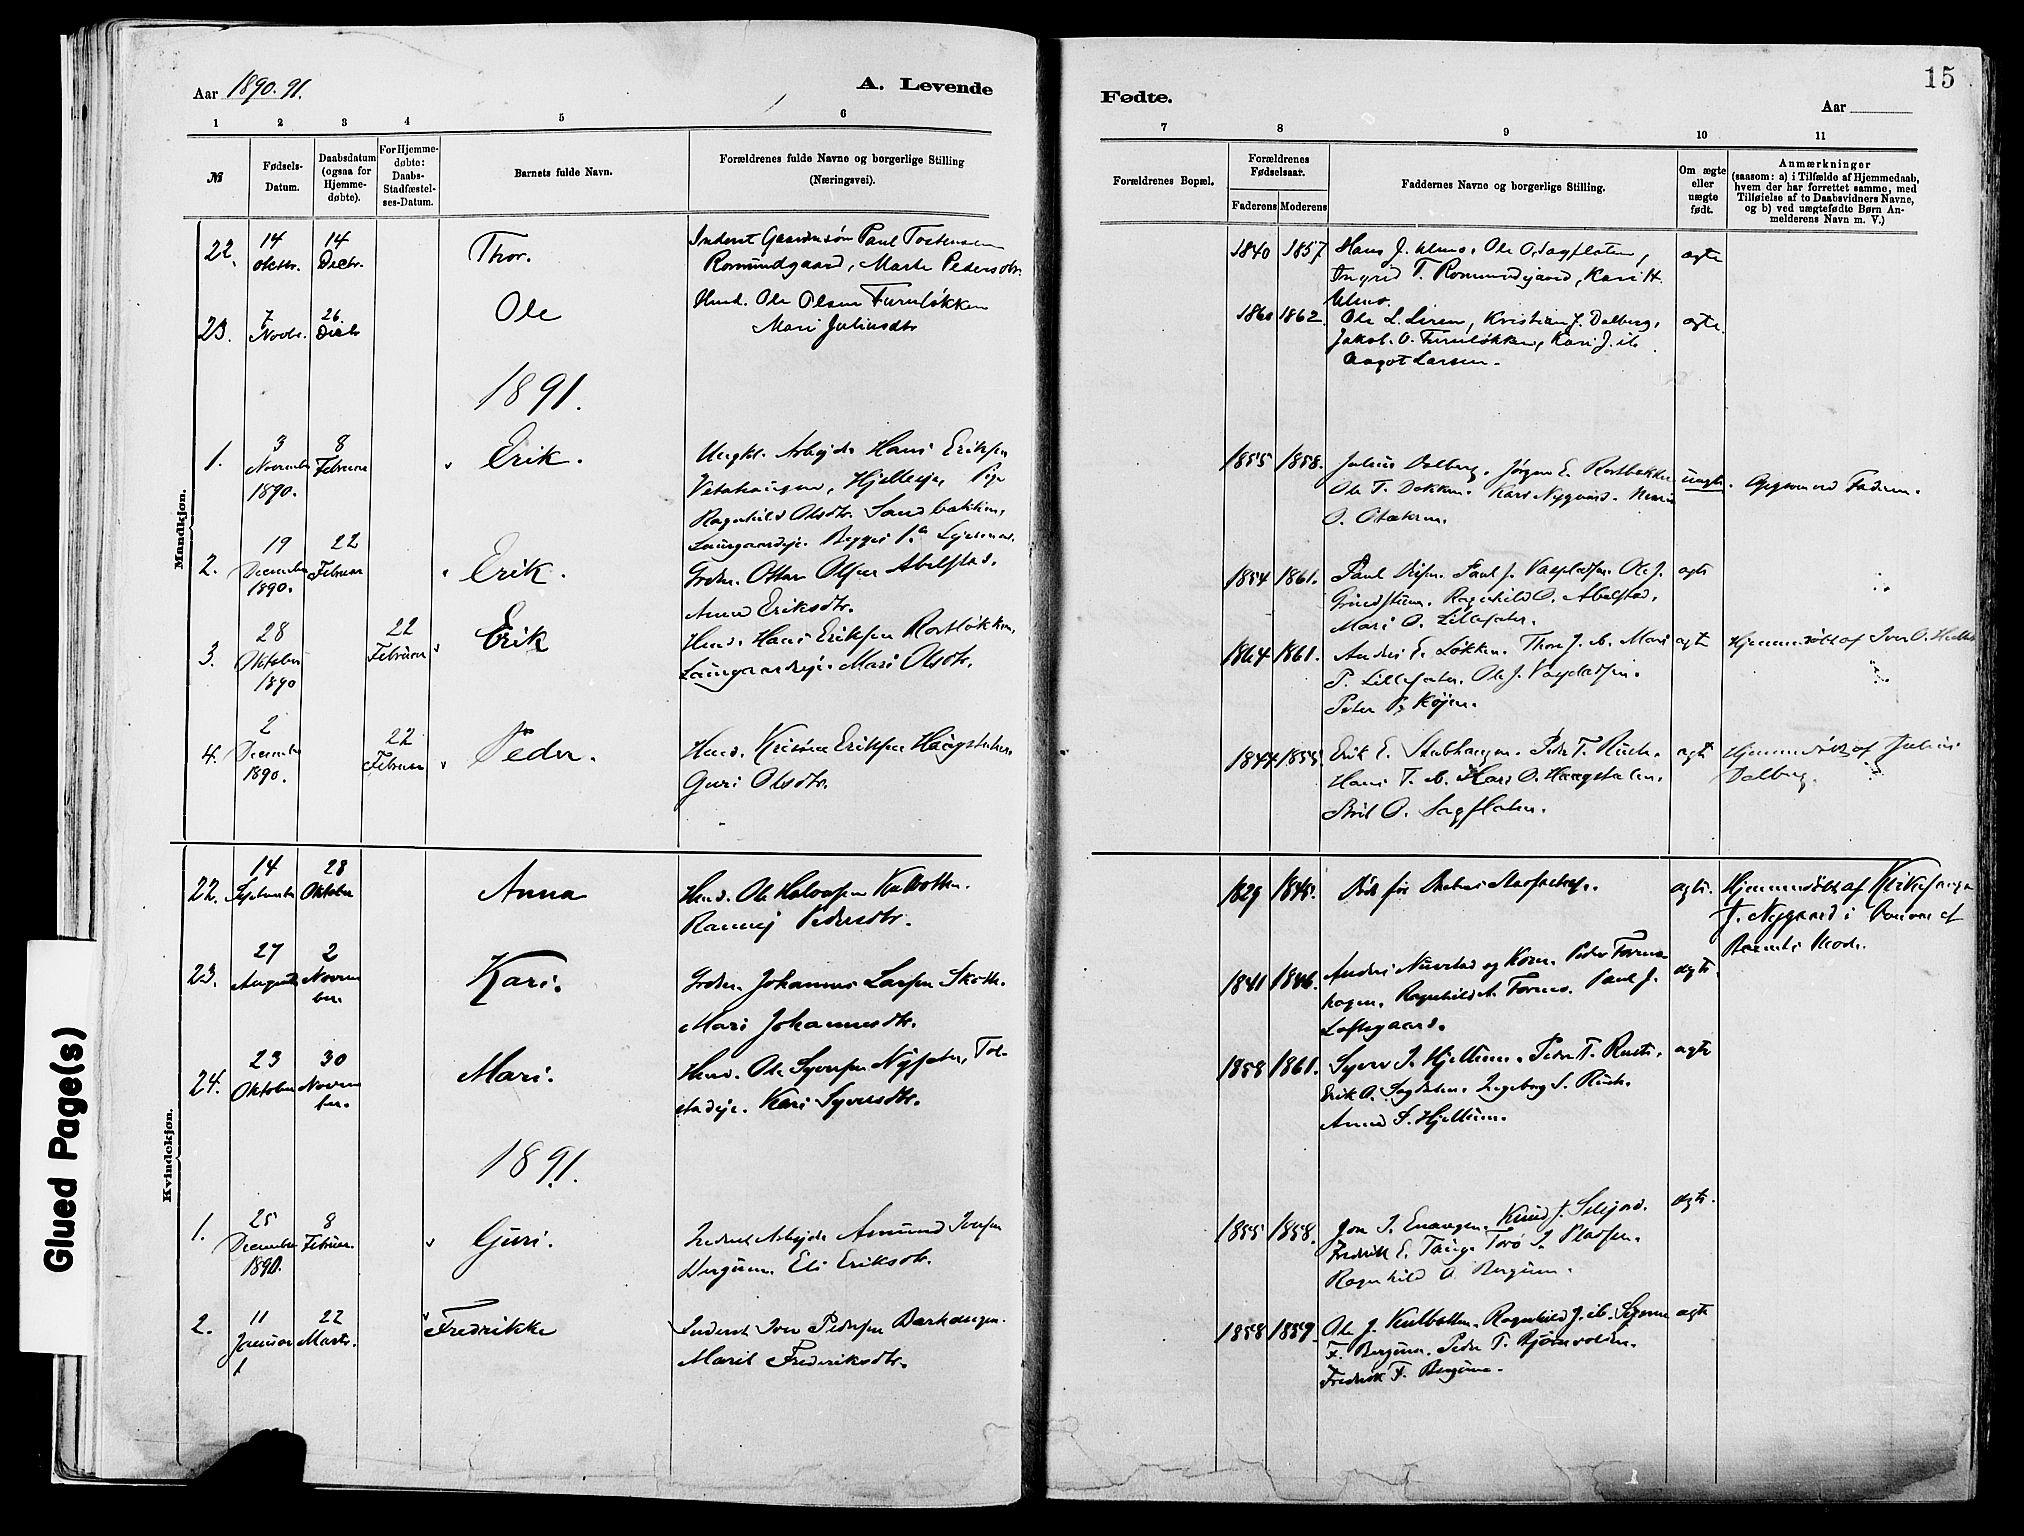 SAH, Vågå prestekontor, Ministerialbok nr. 8, 1886-1904, s. 15